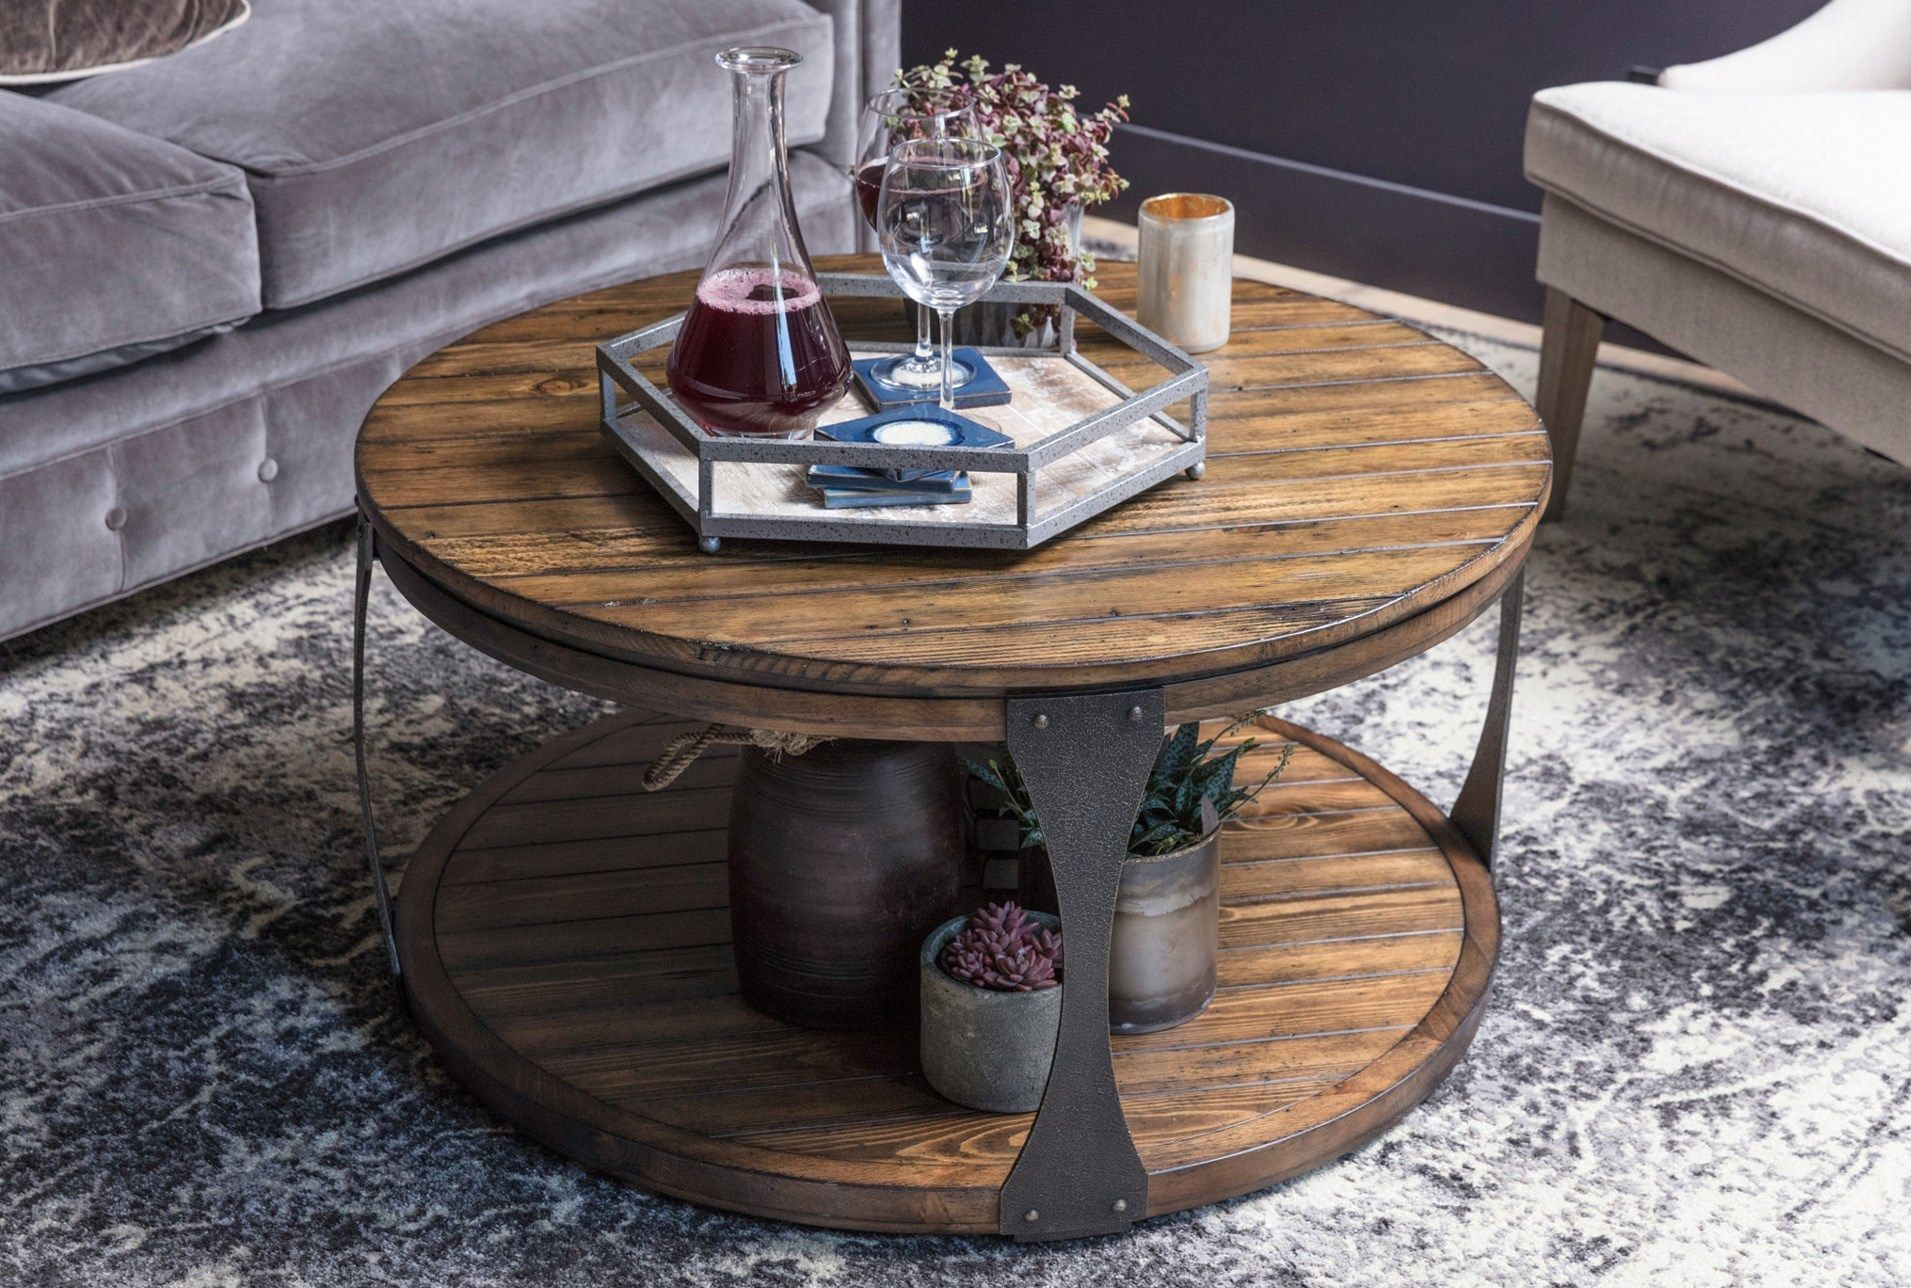 Blanton Round Coffee Table Coffee Table Living Spaces Round Coffee Table Coffee Table [ 1288 x 1911 Pixel ]